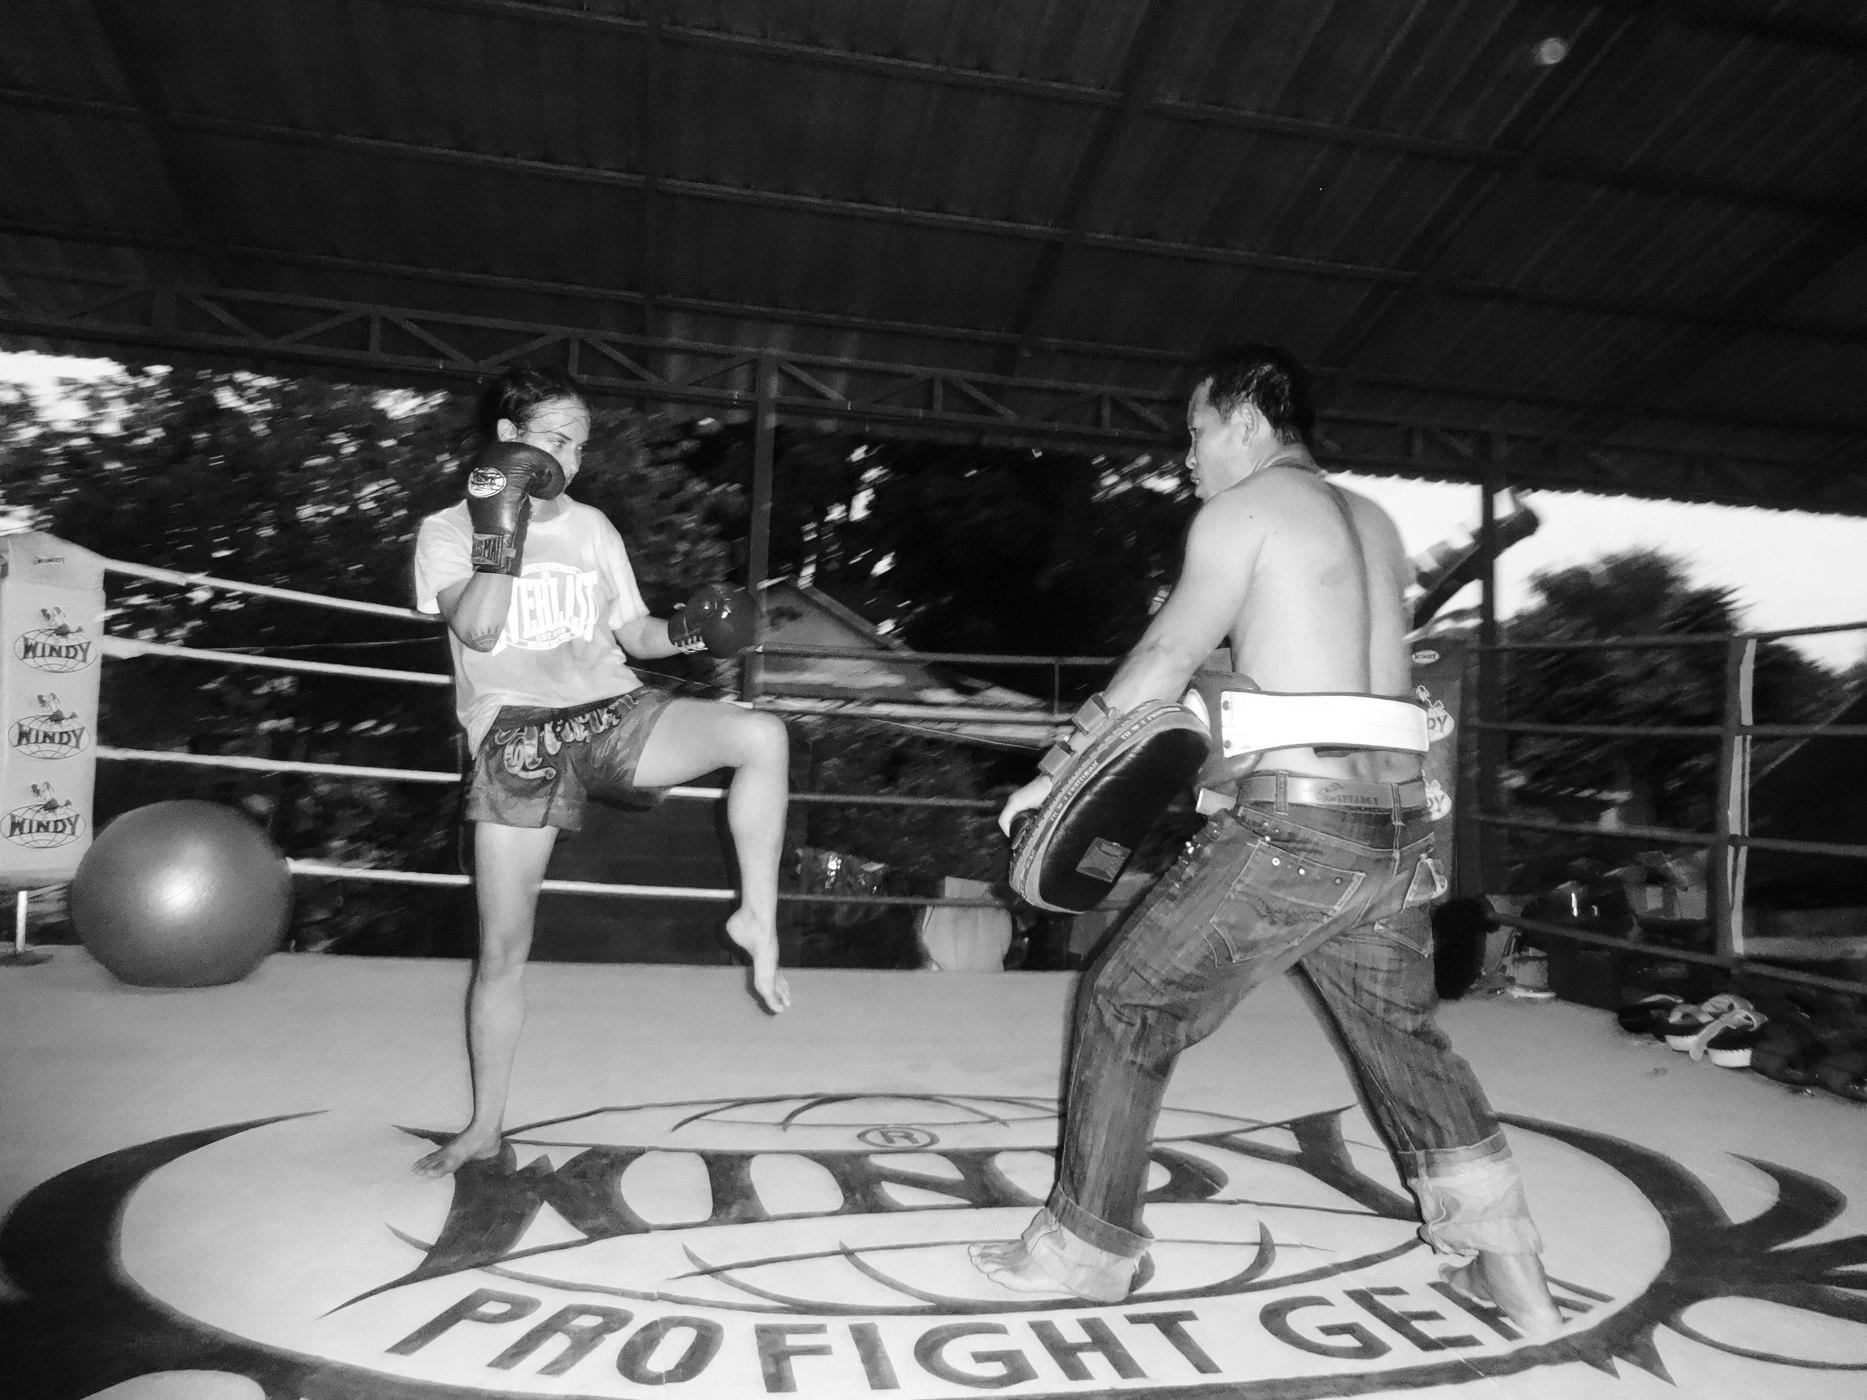 Sylvie on Pads - Preparing for Kick - O Meekhun Pattaya